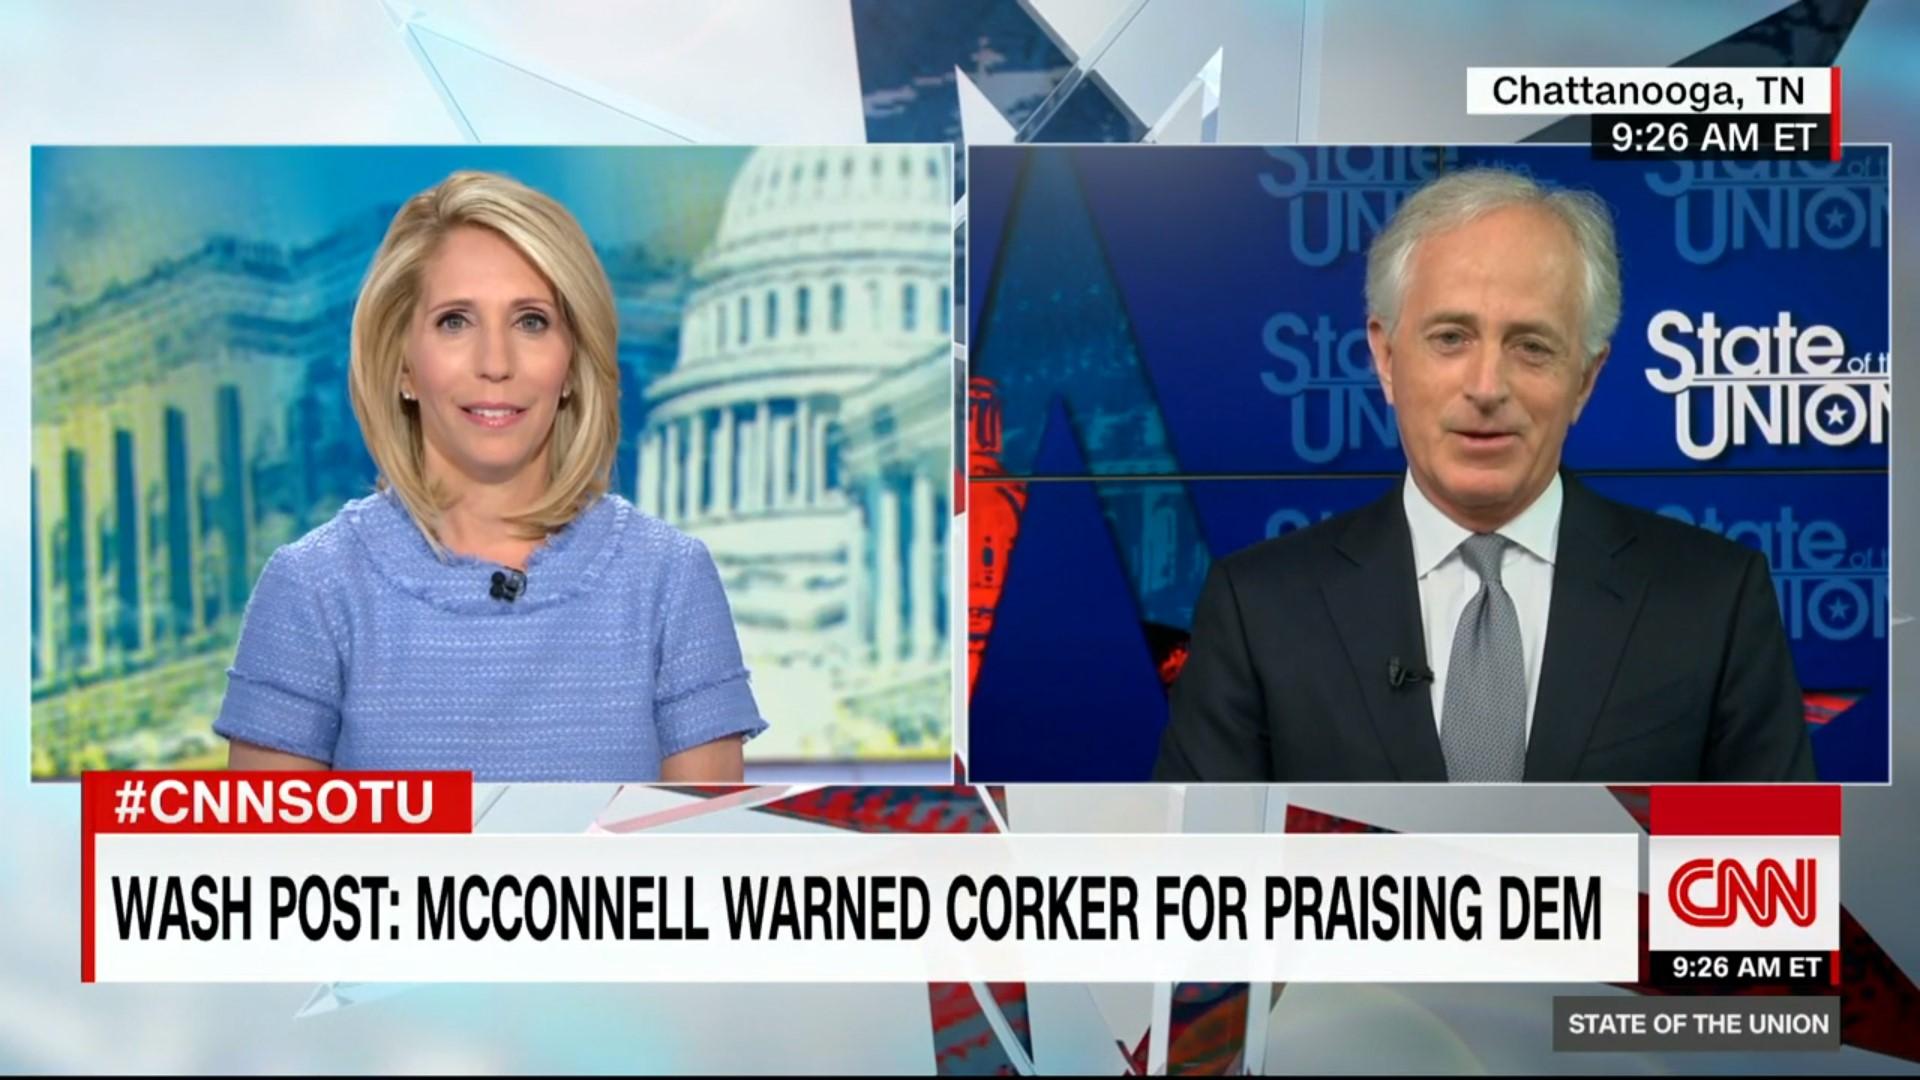 Watch Retiring GOP Sen. Bob Corker Struggle to Explain Why Voters Should Support Marsha Blackburn